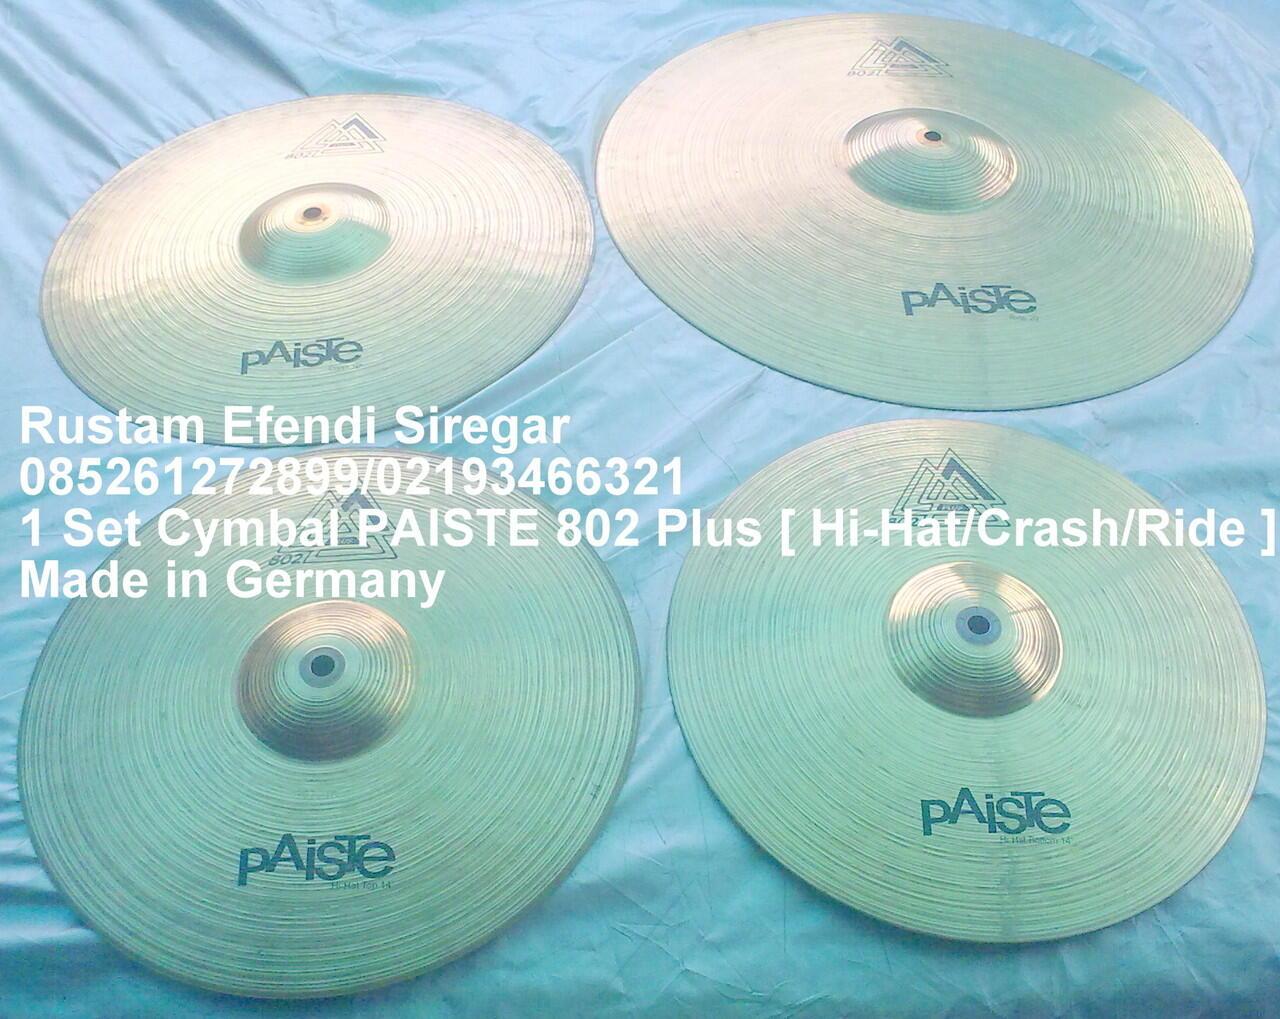 cymbal PAISTE 802 Plus